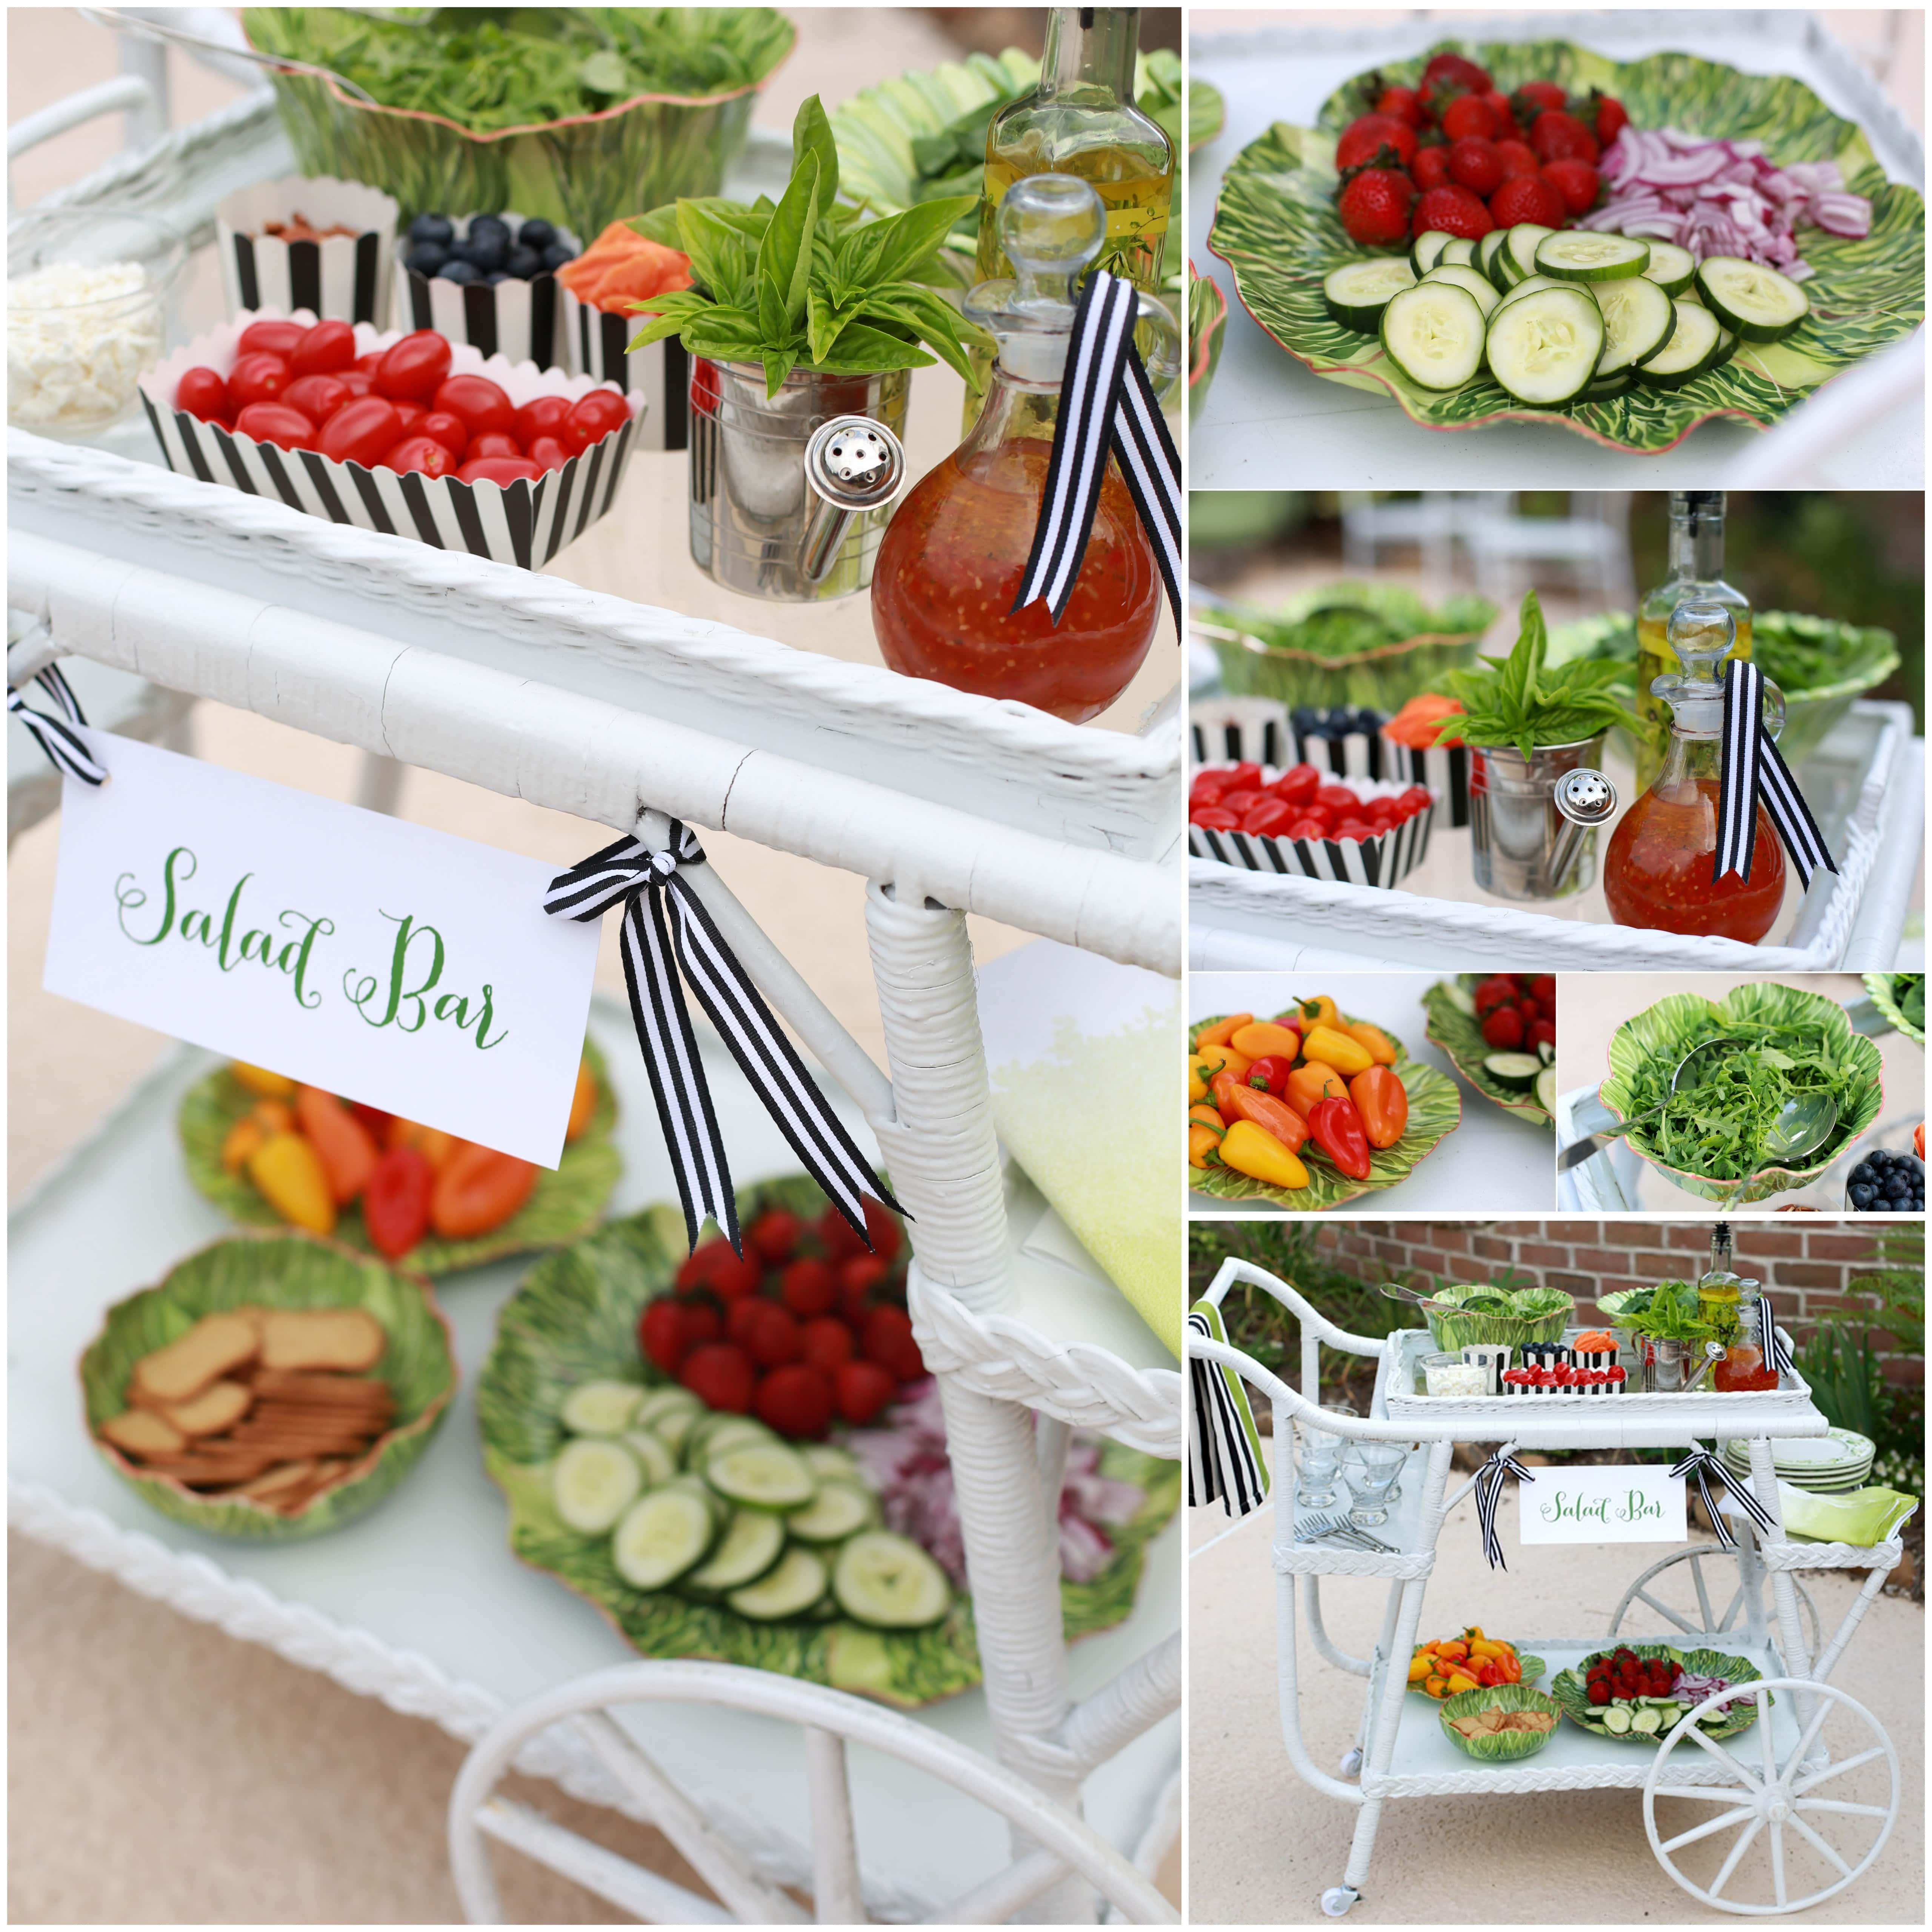 Build a Summer Salad Bar! Idea to SAVE!